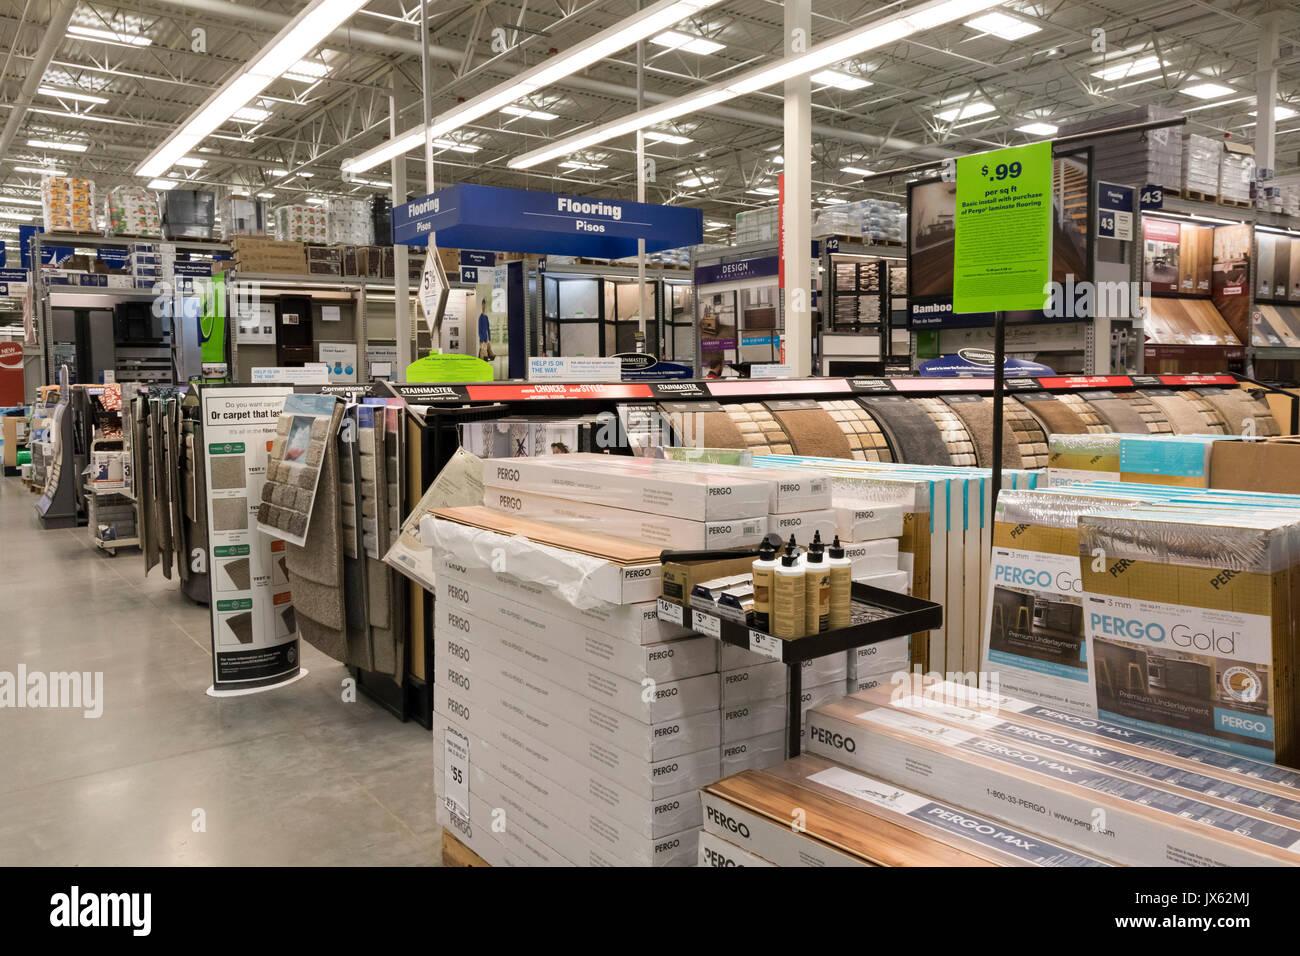 flooring materials, Lowe's hardware store, Pasco, Washington State, USA - Stock Image